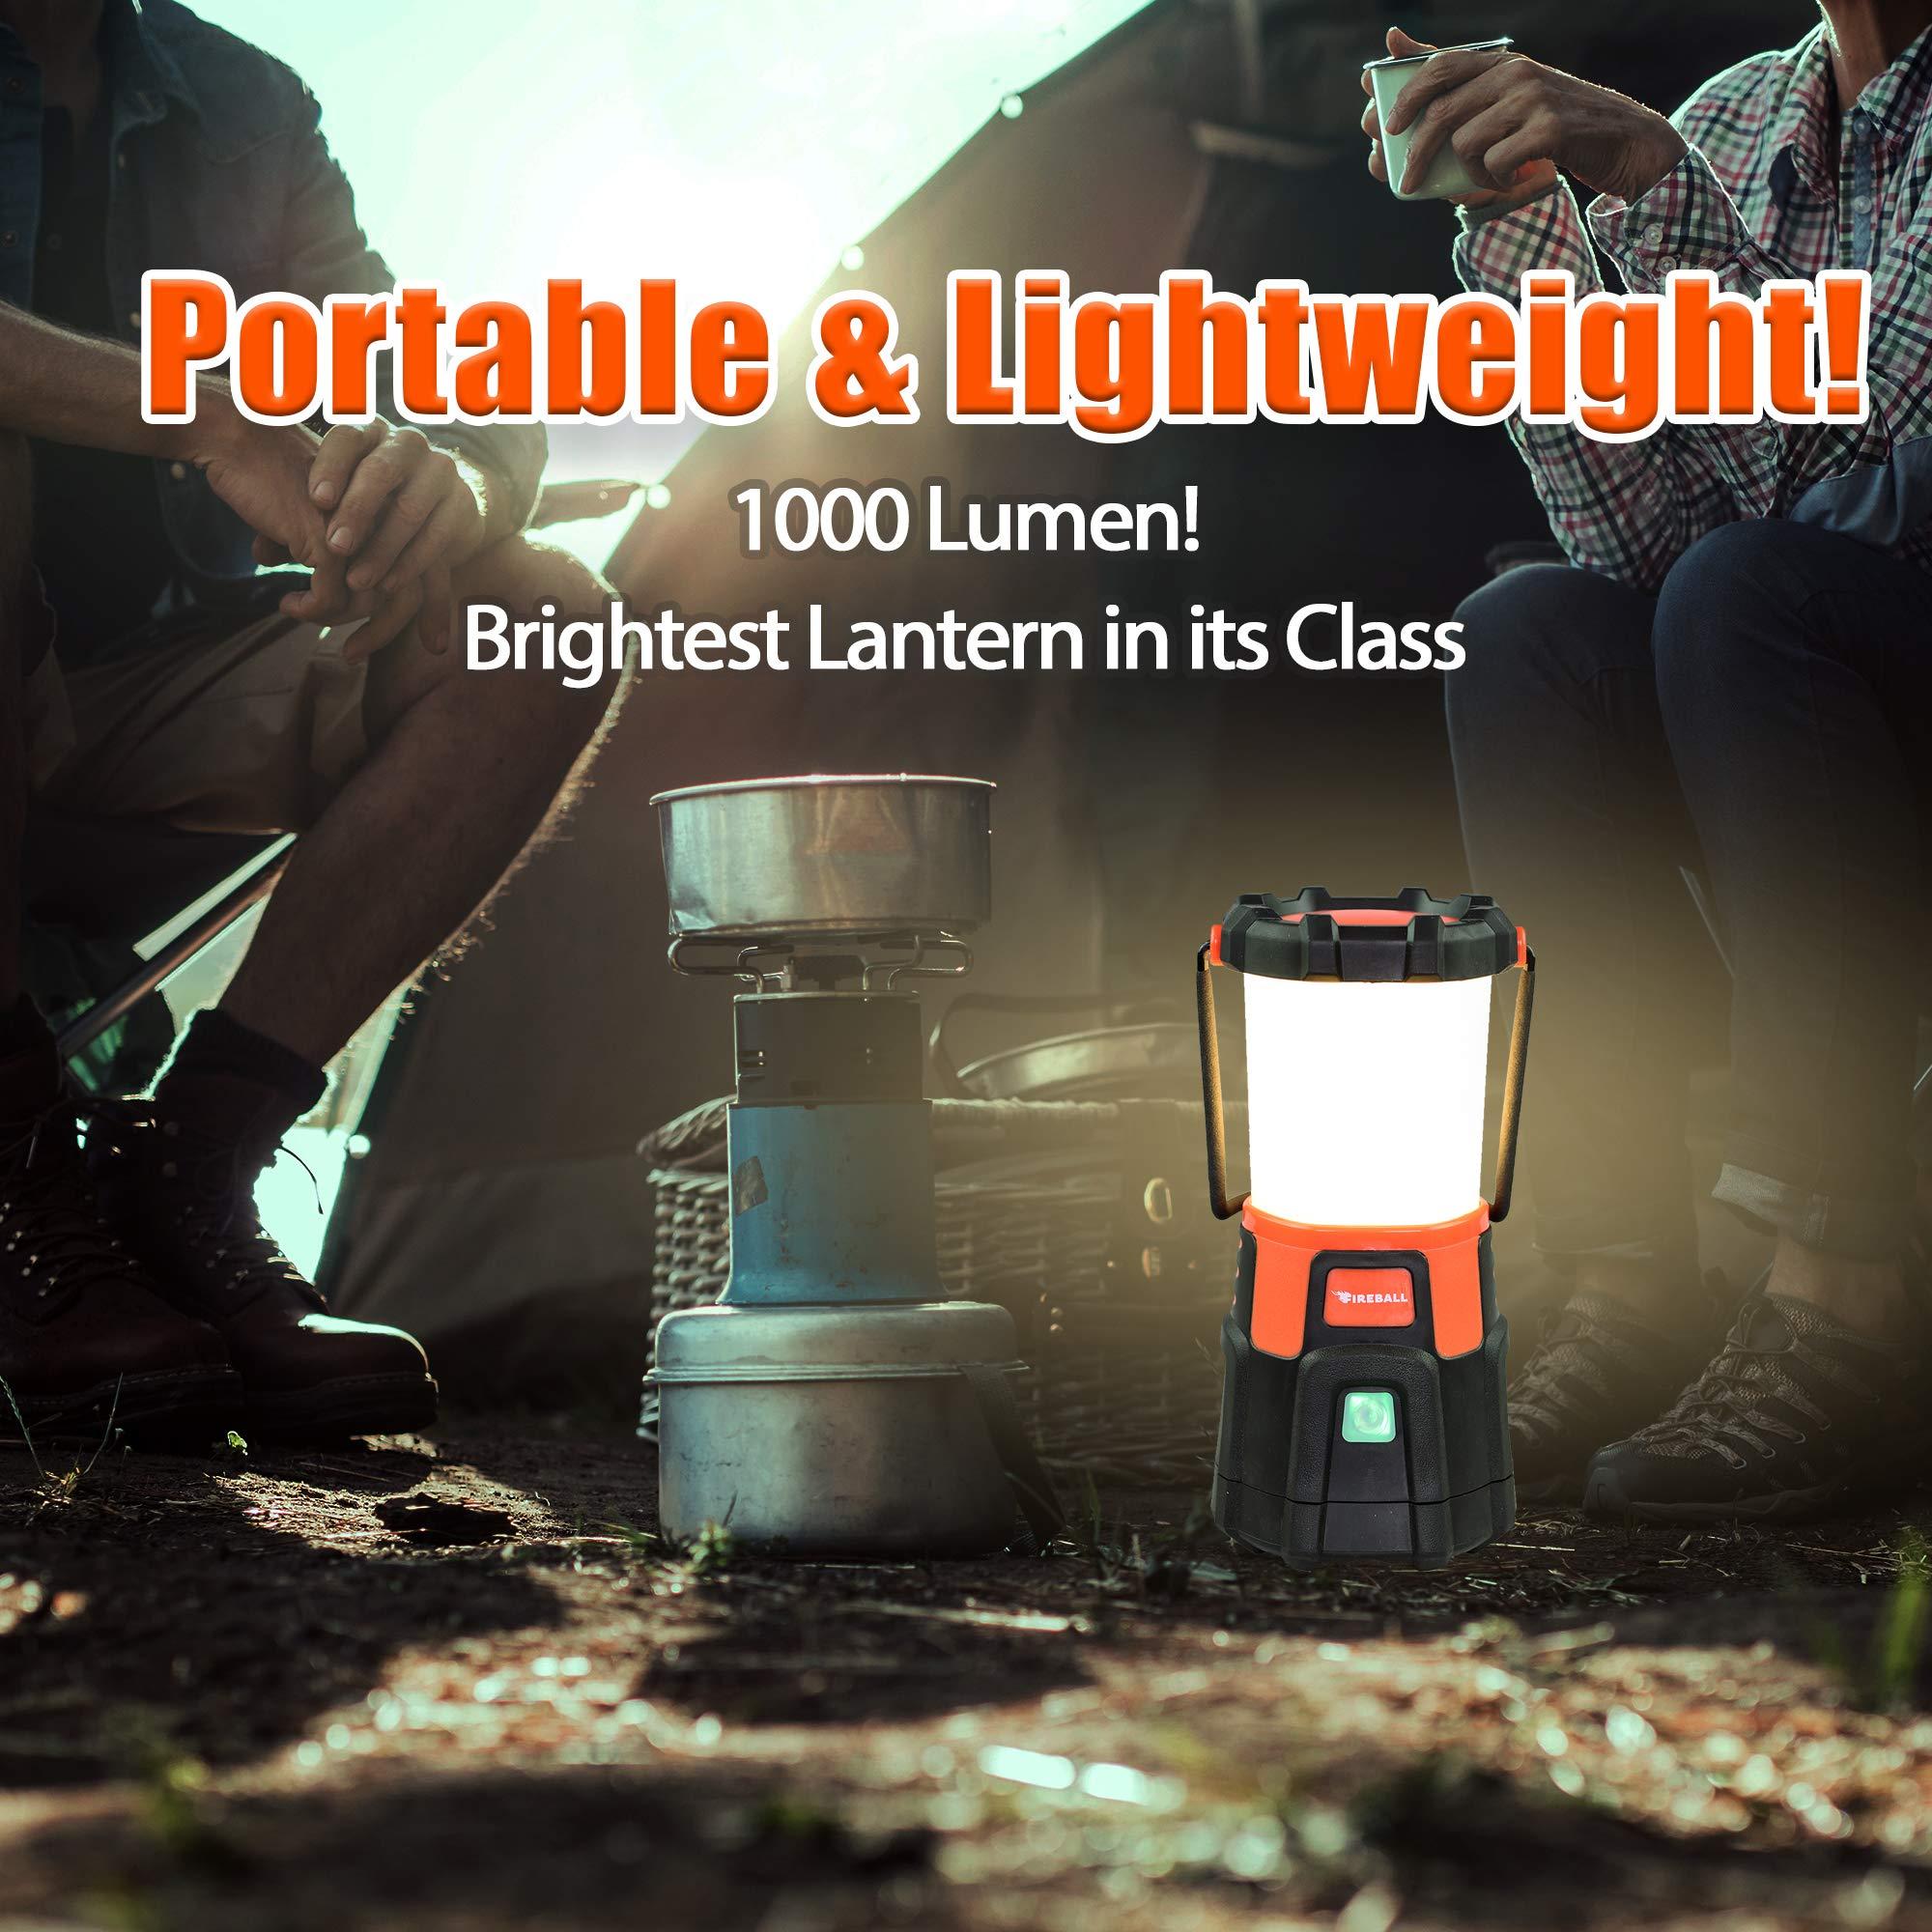 Blazin' Fireball | Brightest Lanterns Battery Powered | LED Hurricane Lantern | Emergency, Storm, Camping Torch | Battery Operated Lights | 1000 Lumen Lantern by Blazin' Bison (Image #5)